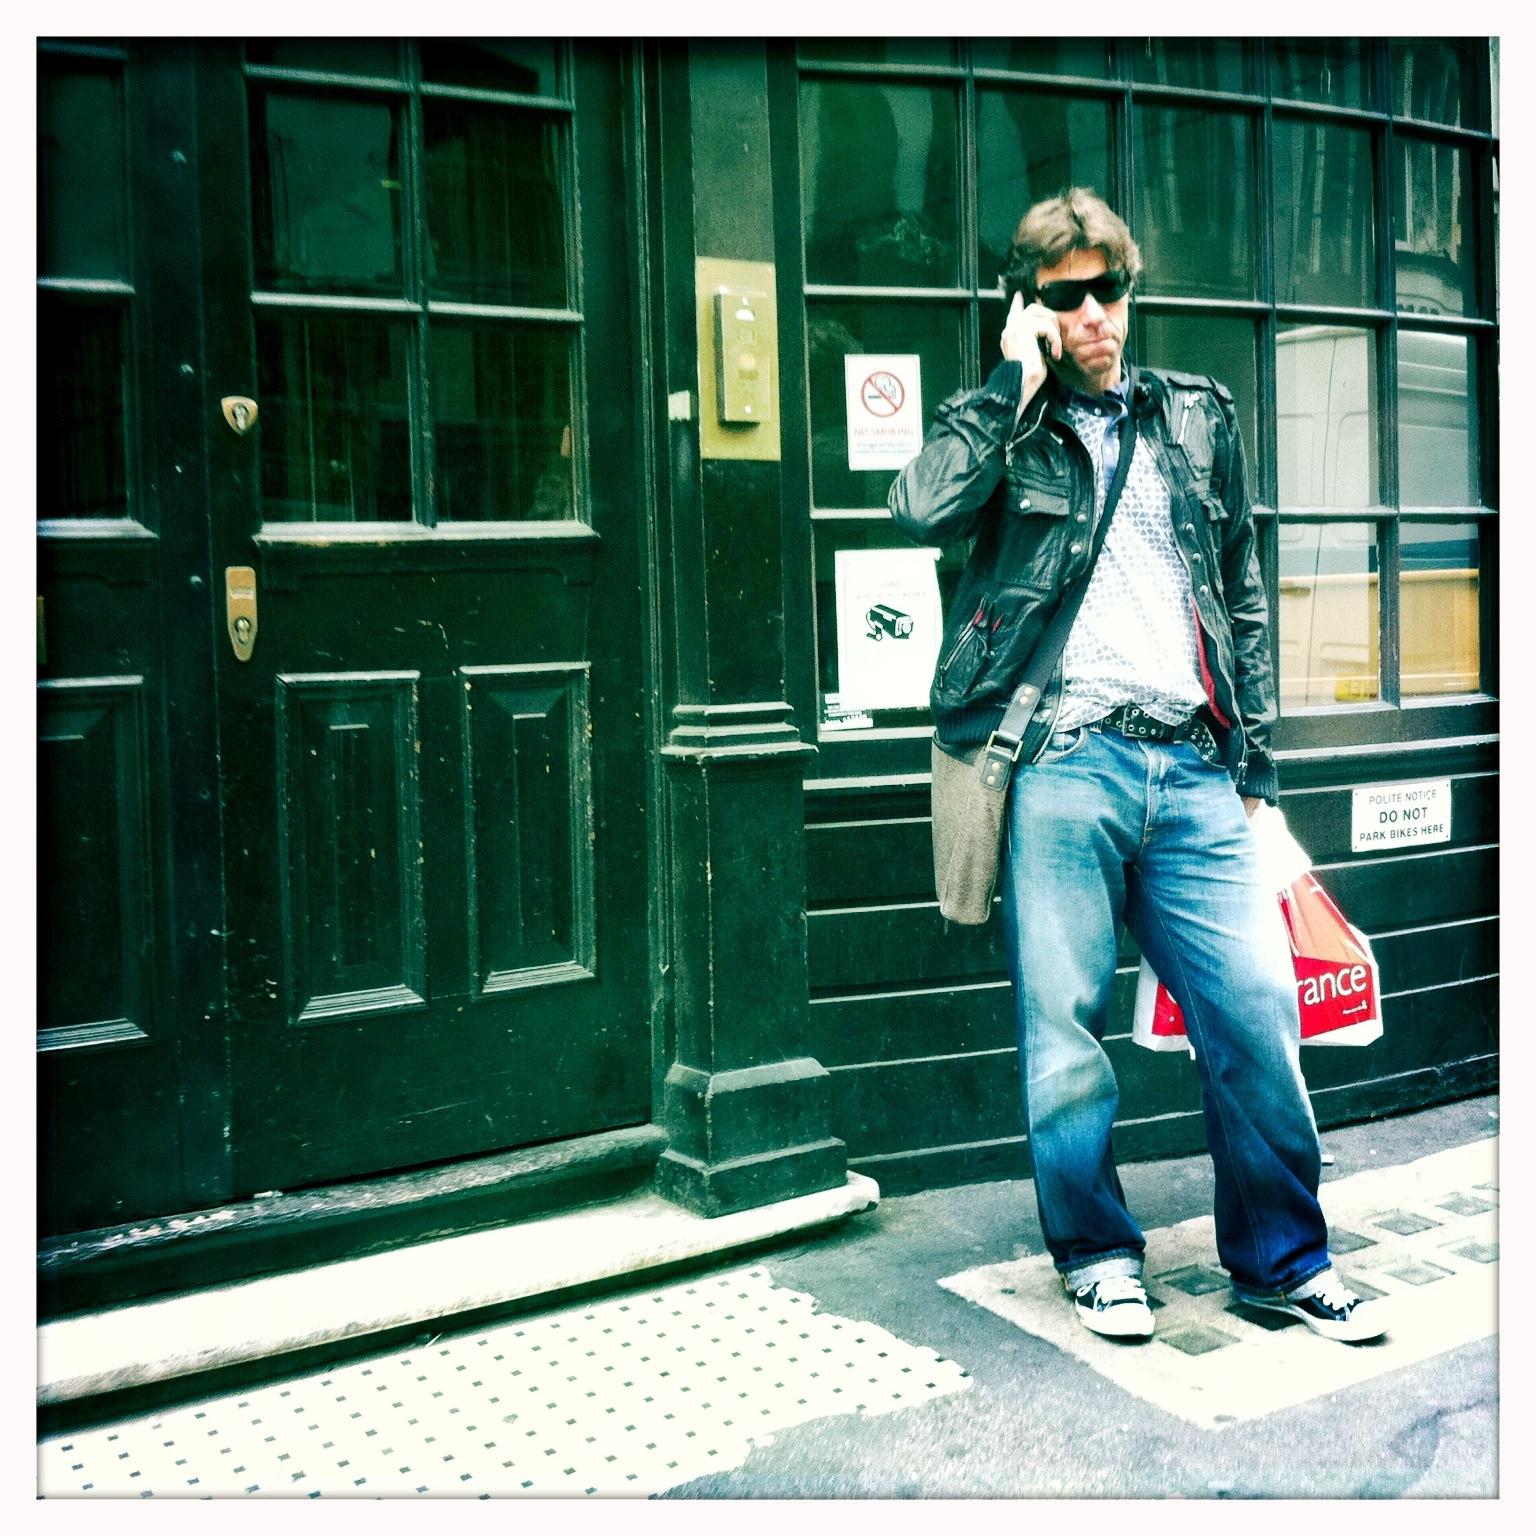 people---soho-london_4767793172_o.jpg